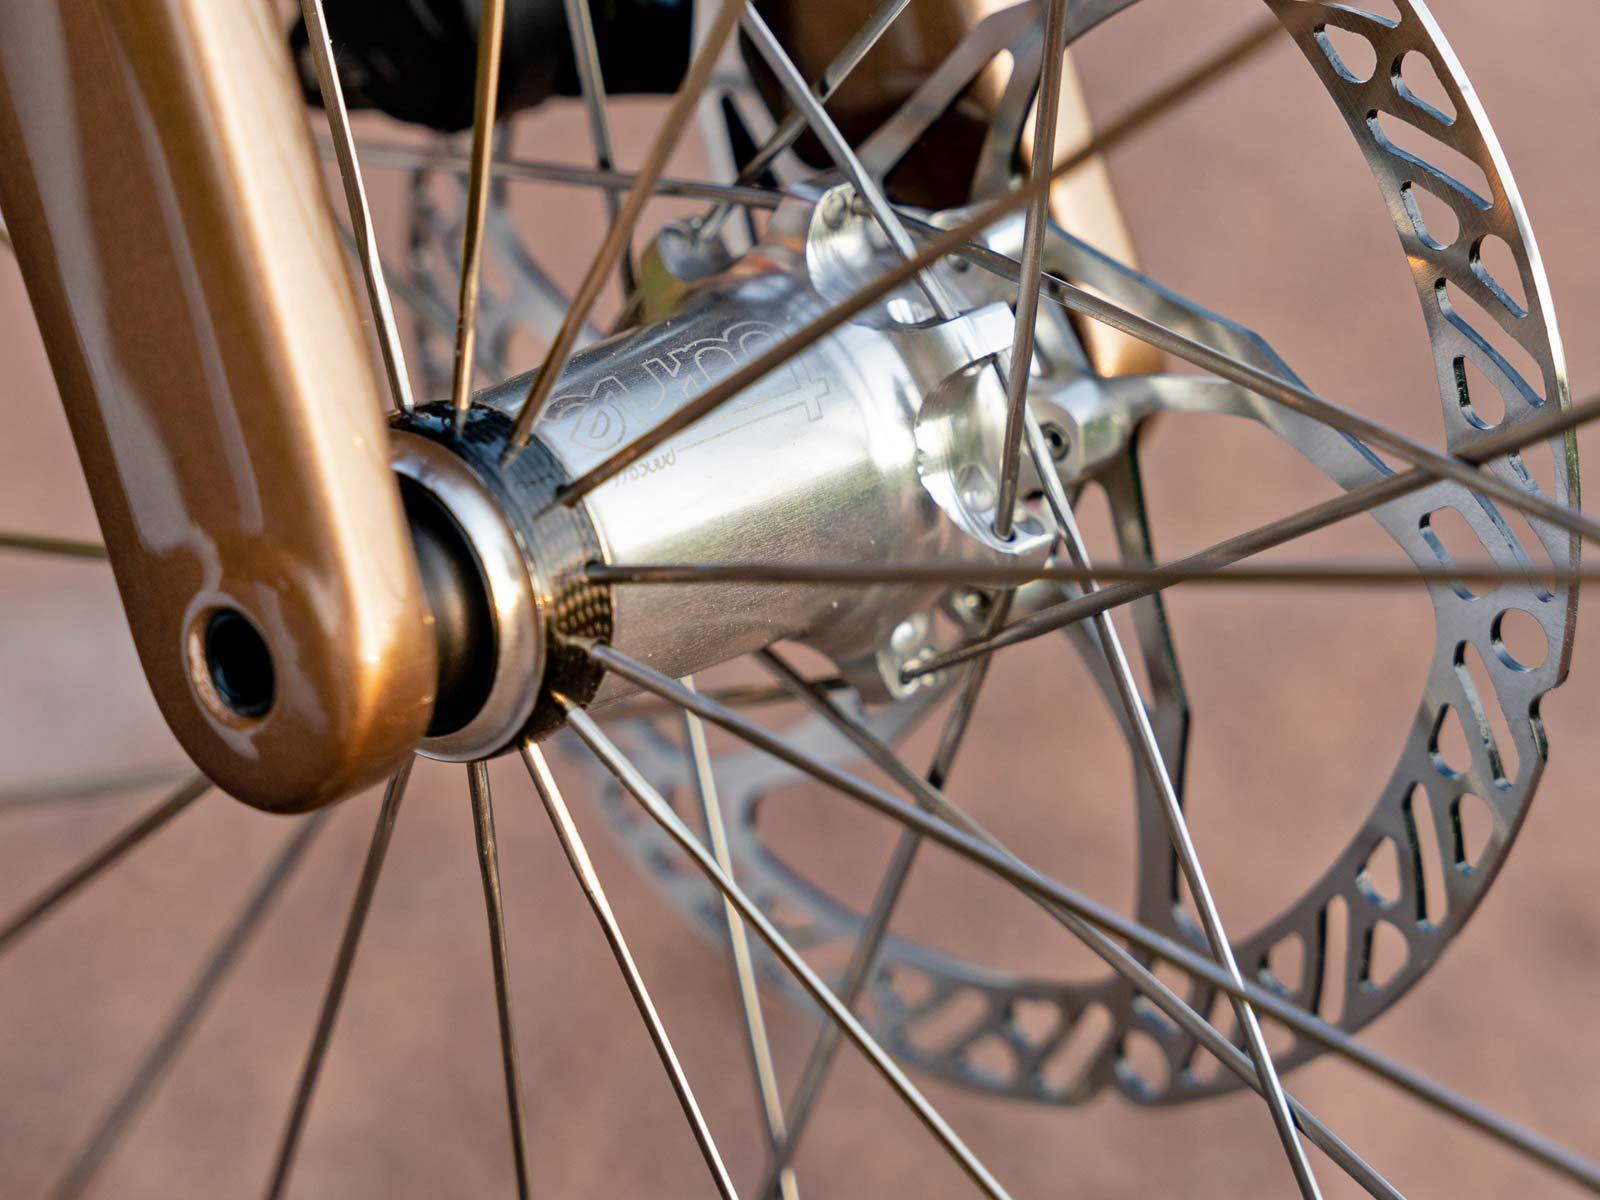 custom Scott Addict Gravel Tuned Dangerholm edition lightweight carbon prototype gravel bike project,Tune Princess carbon hub